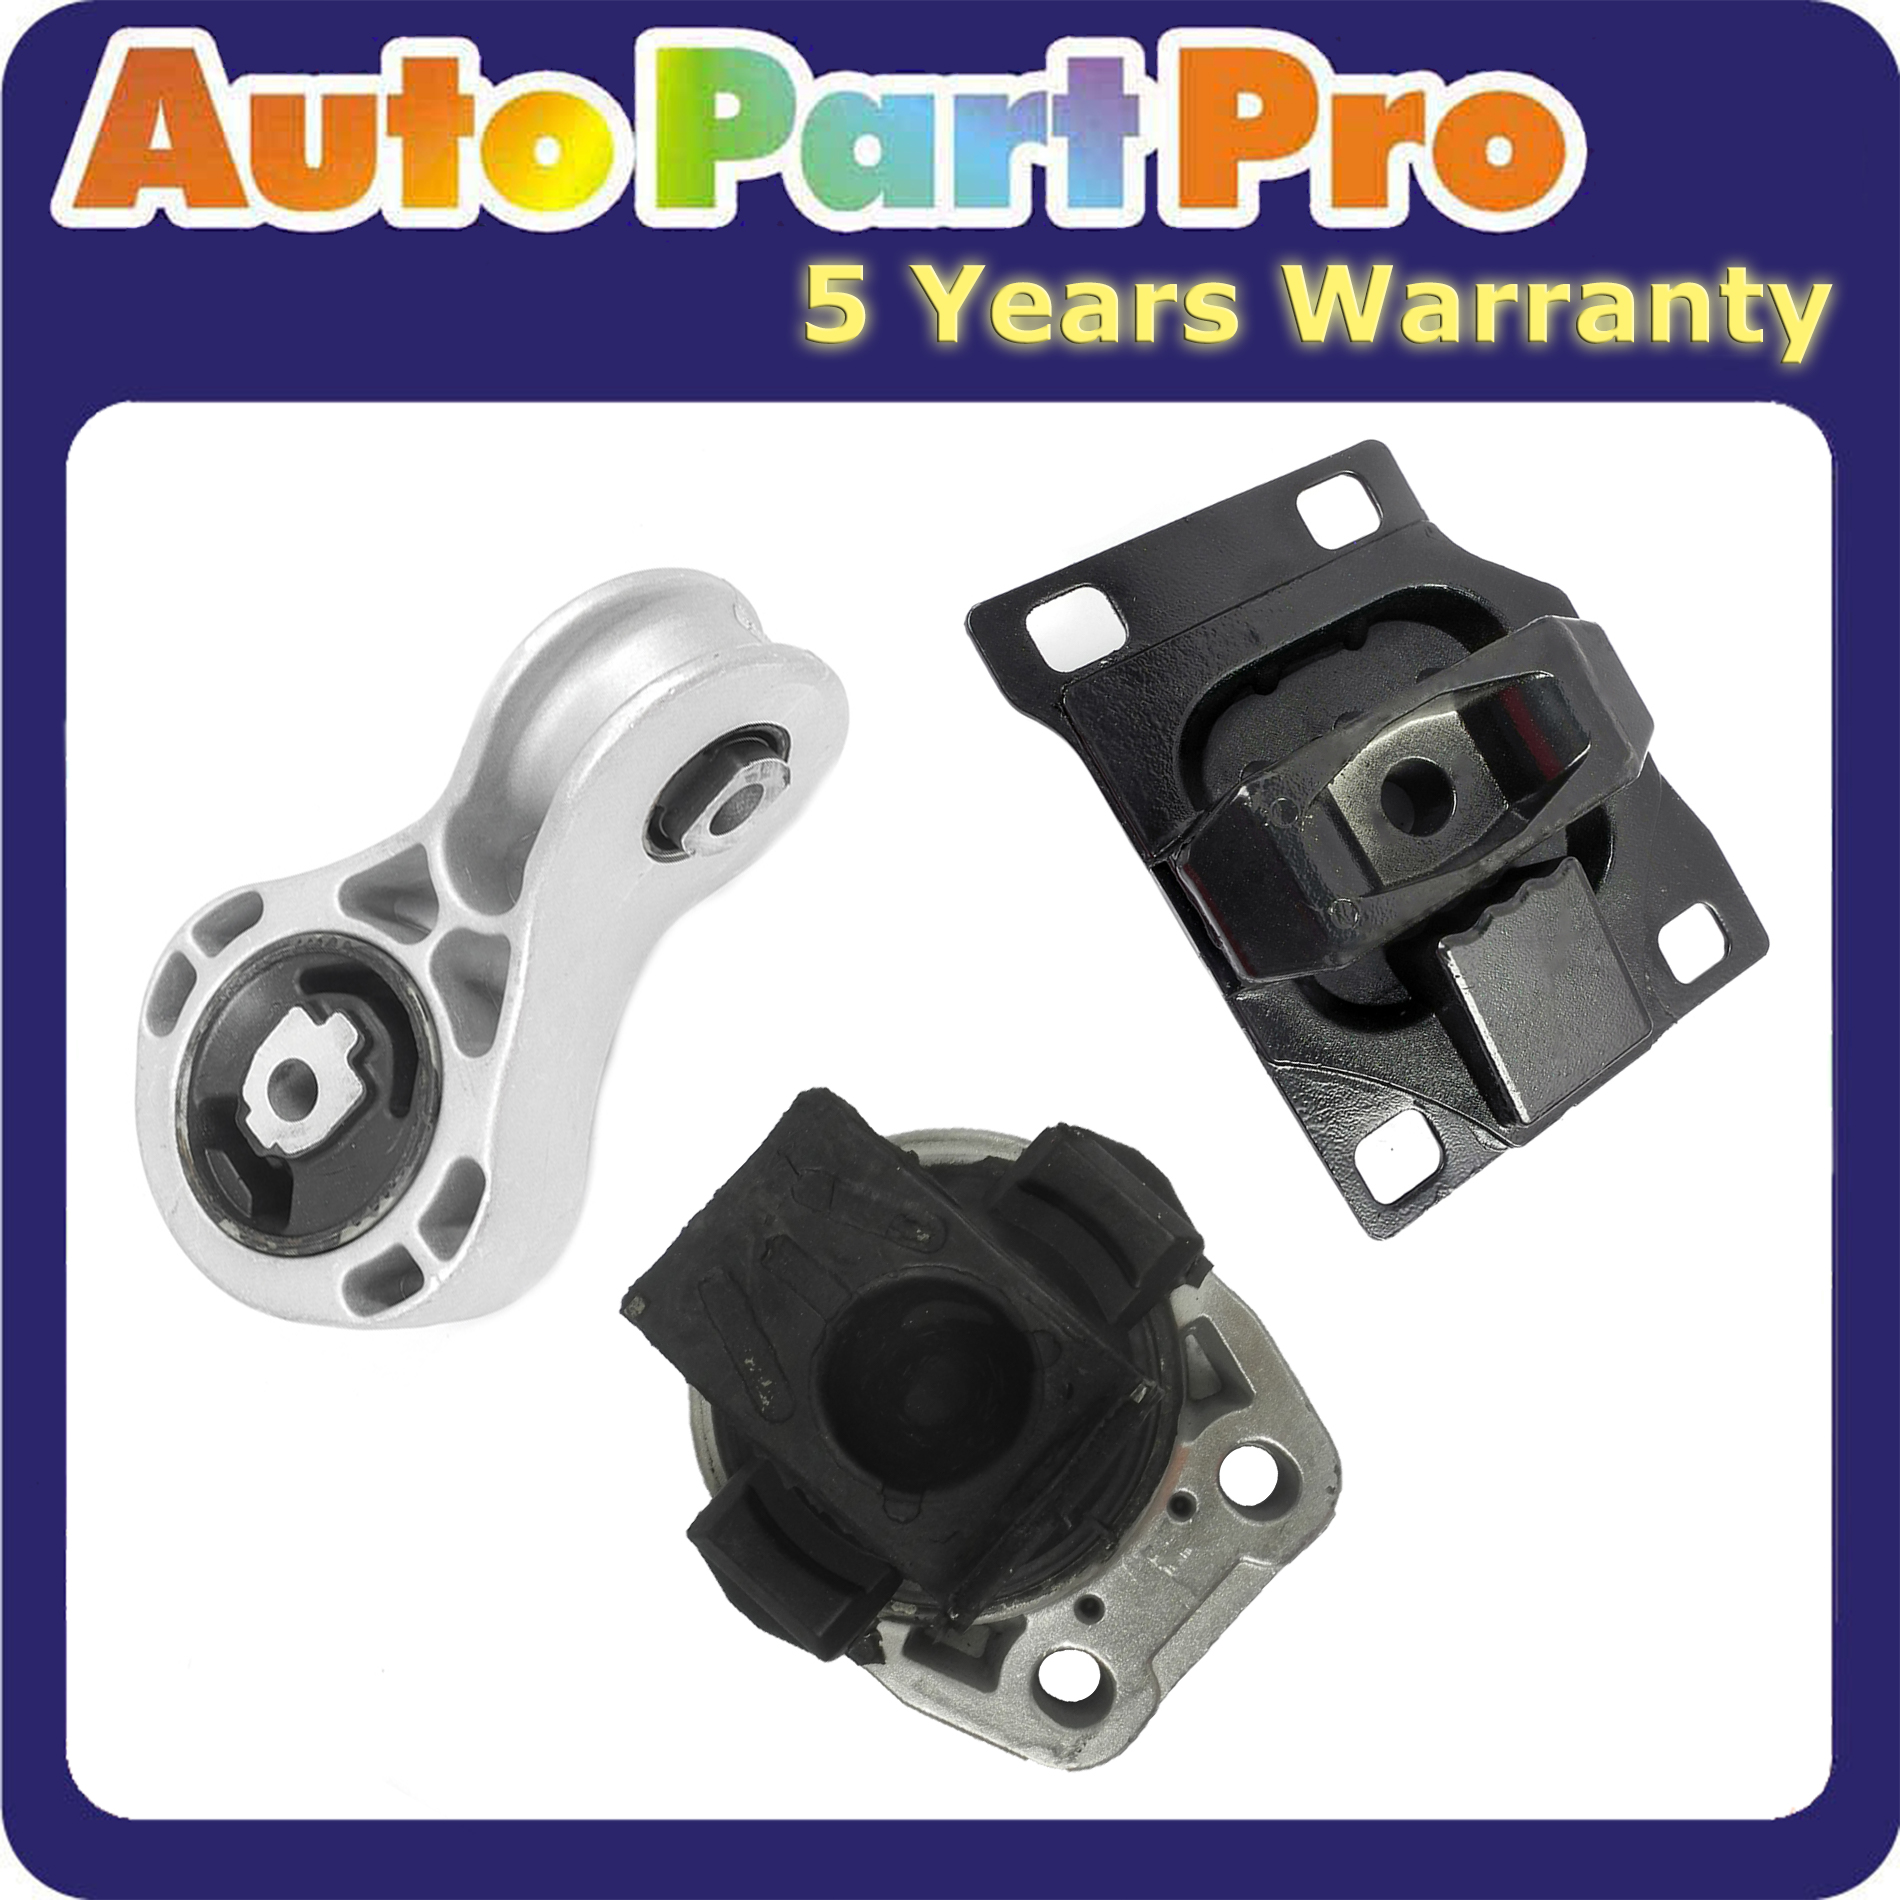 Engine Motor /& Trans Mount 3PCS For 2008-2011 Ford Focus 2.0L 5322 5495 2986